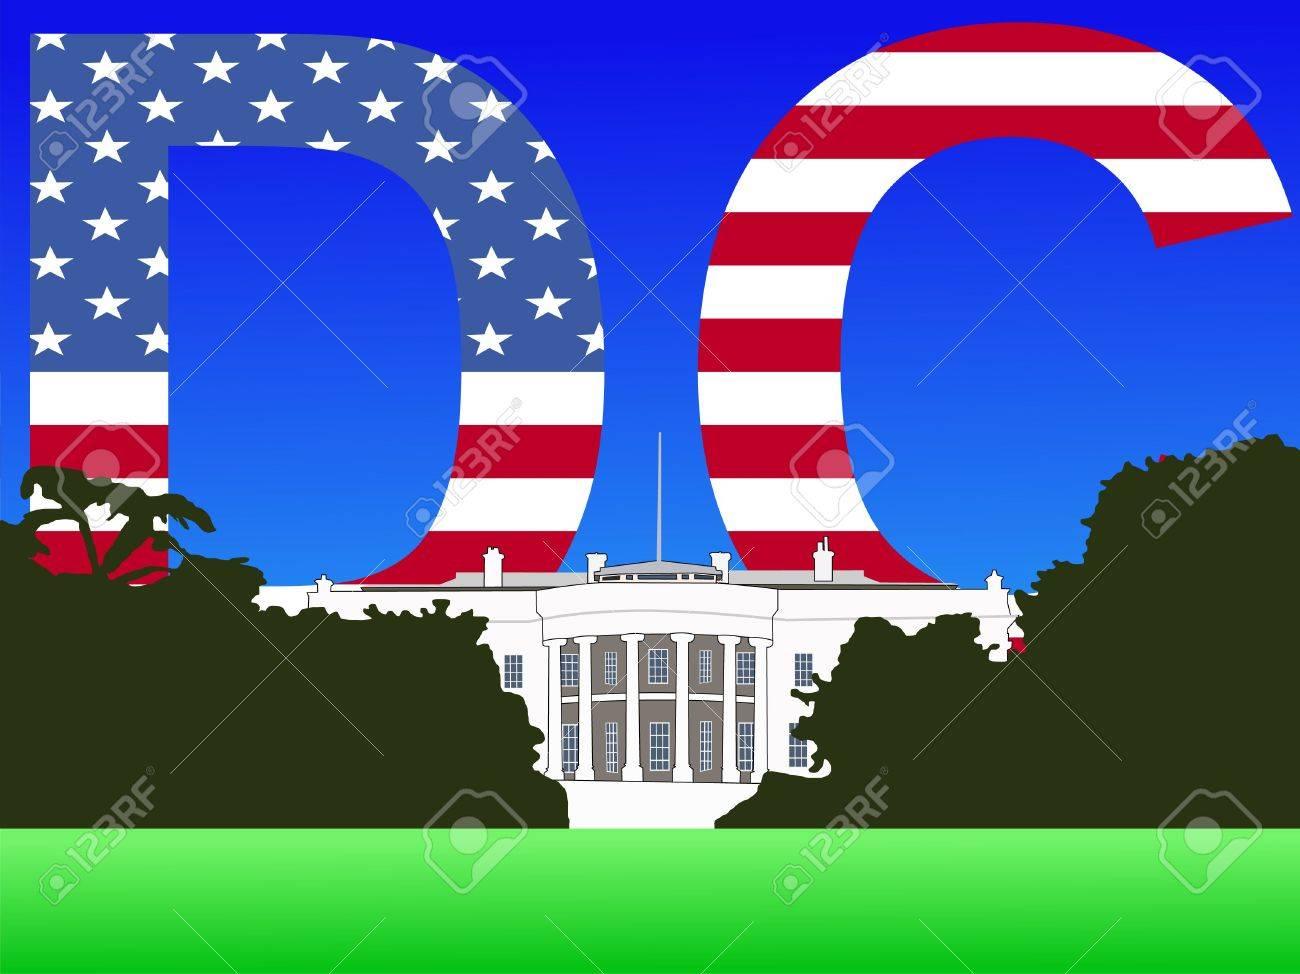 White House Washington DC with flag text illustration Stock Illustration - 1342539